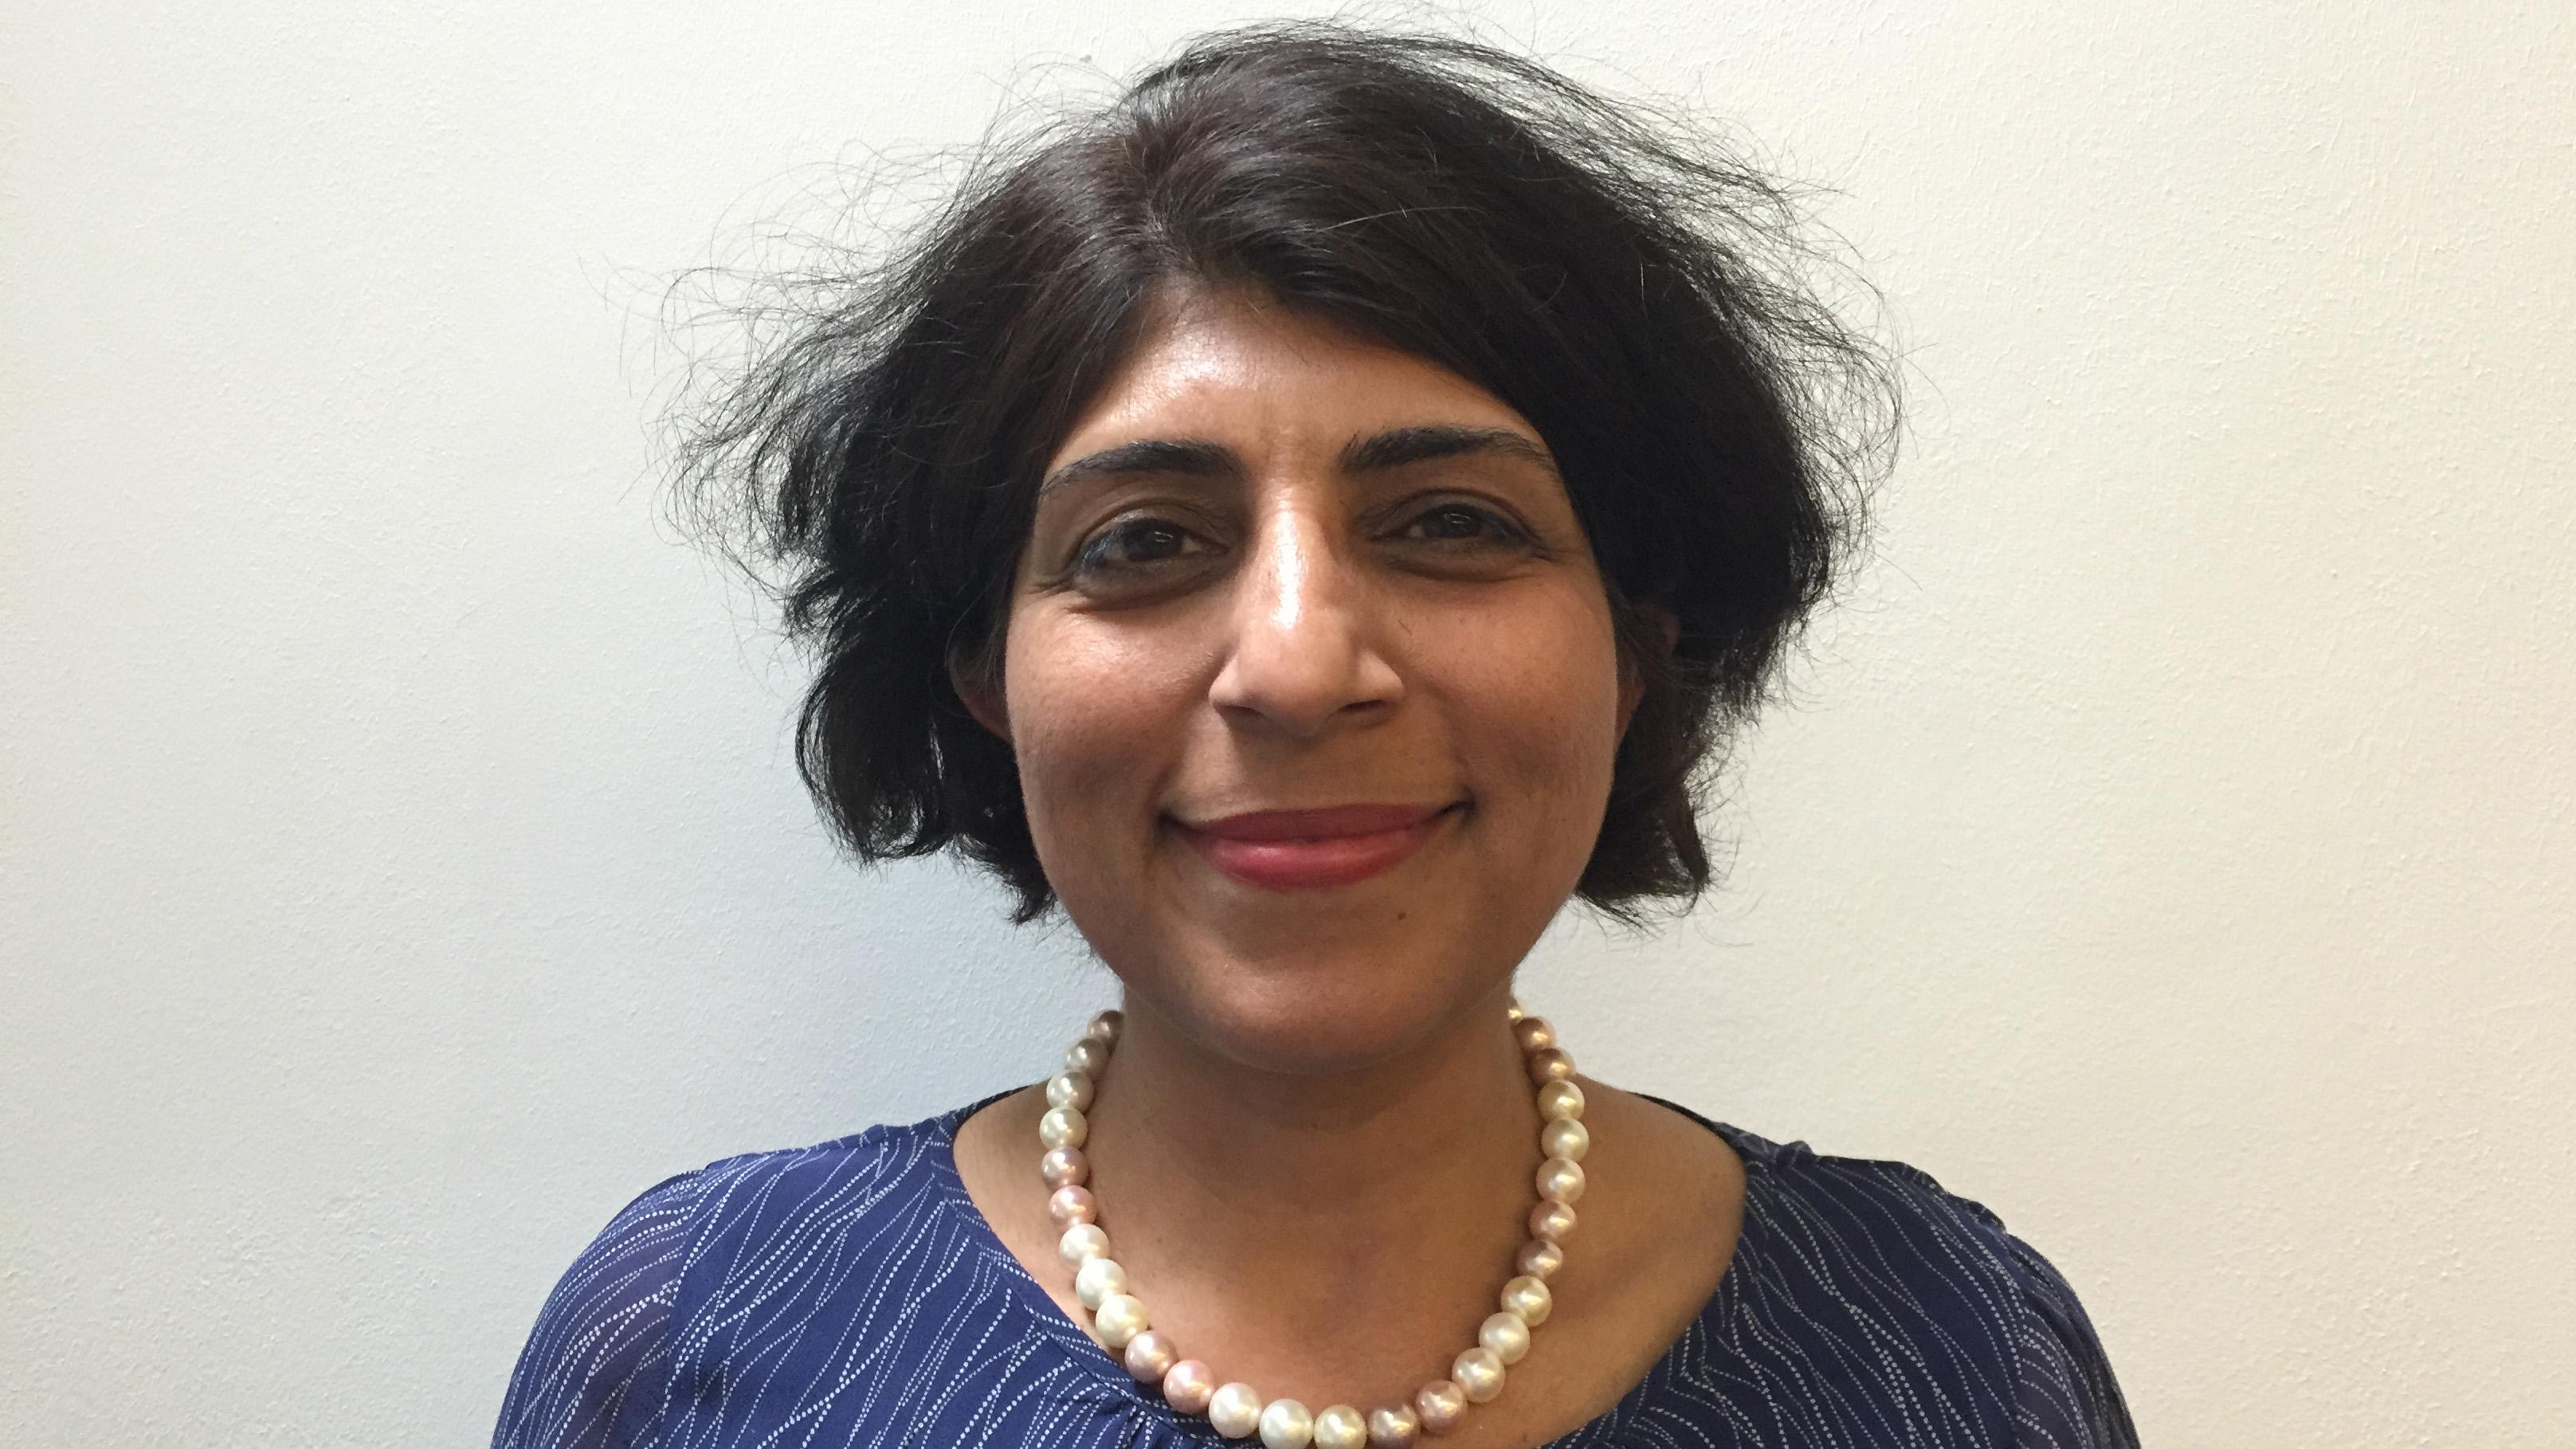 Professor Khalida Ismai